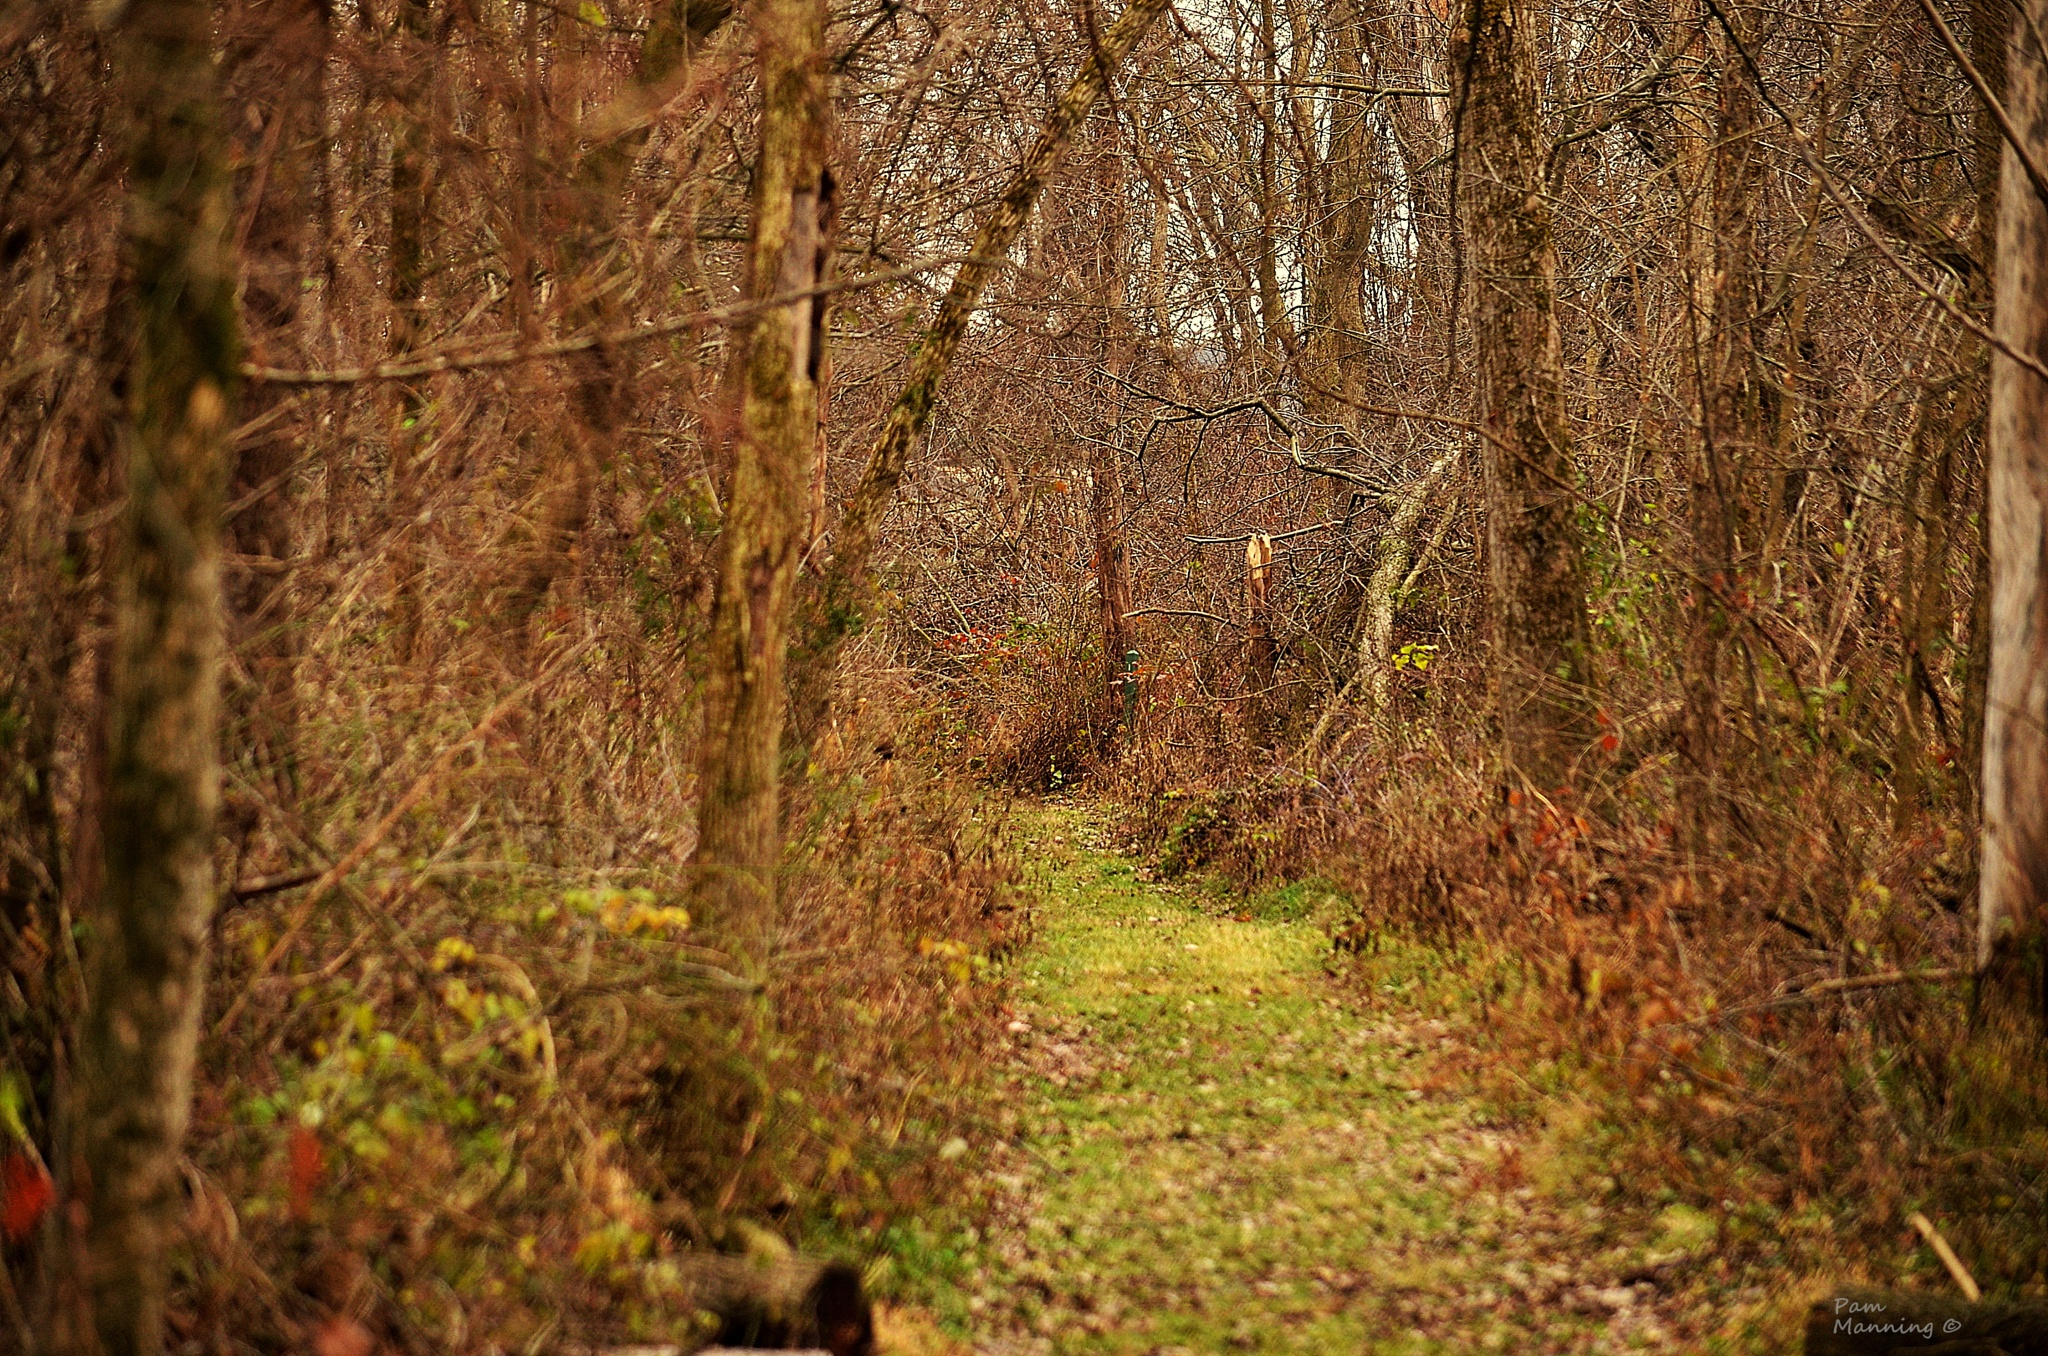 Forrest trail by pam.satterfieldmanning